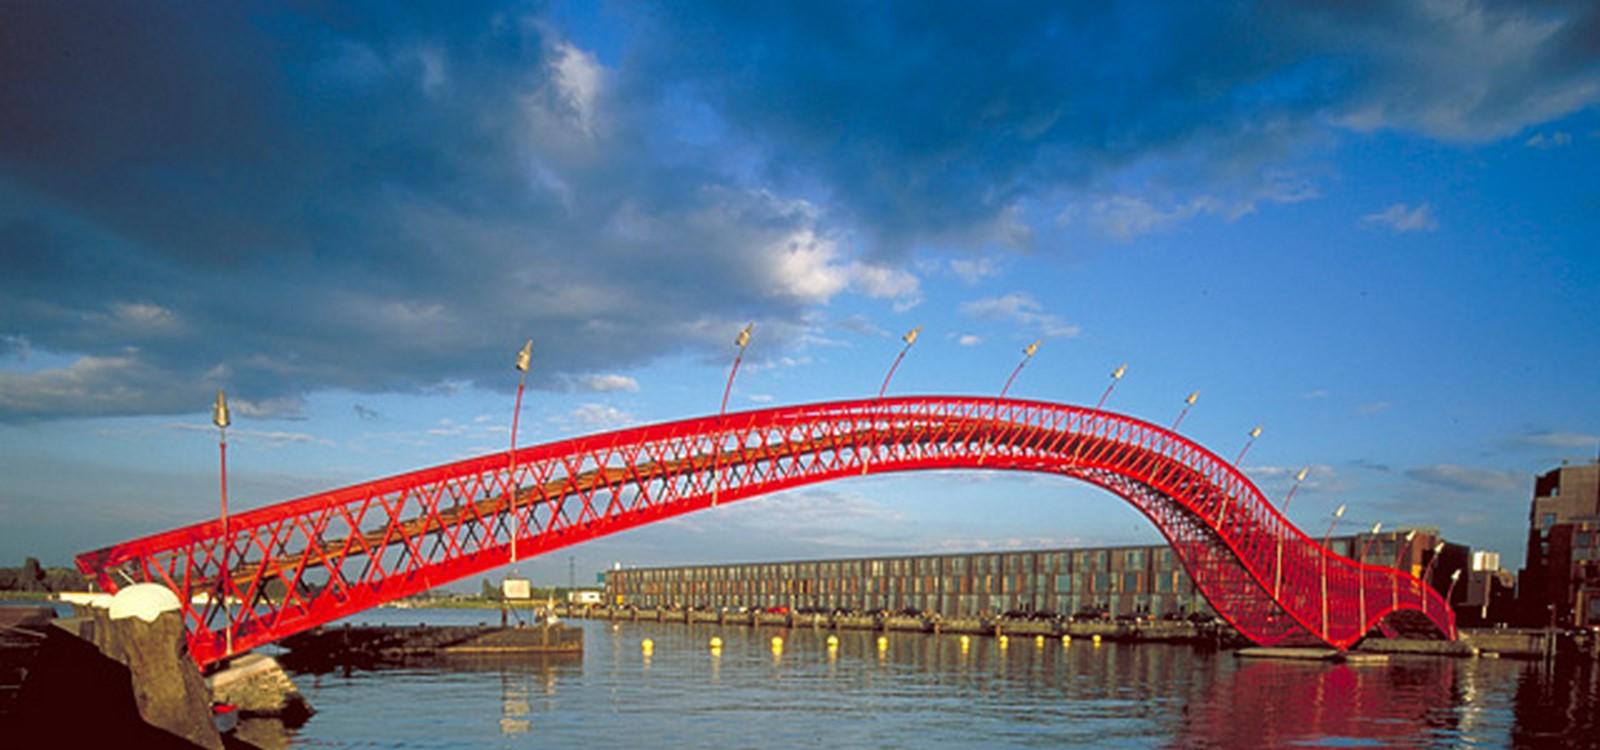 Borneo + Sporenburg Bridges - Sheet4